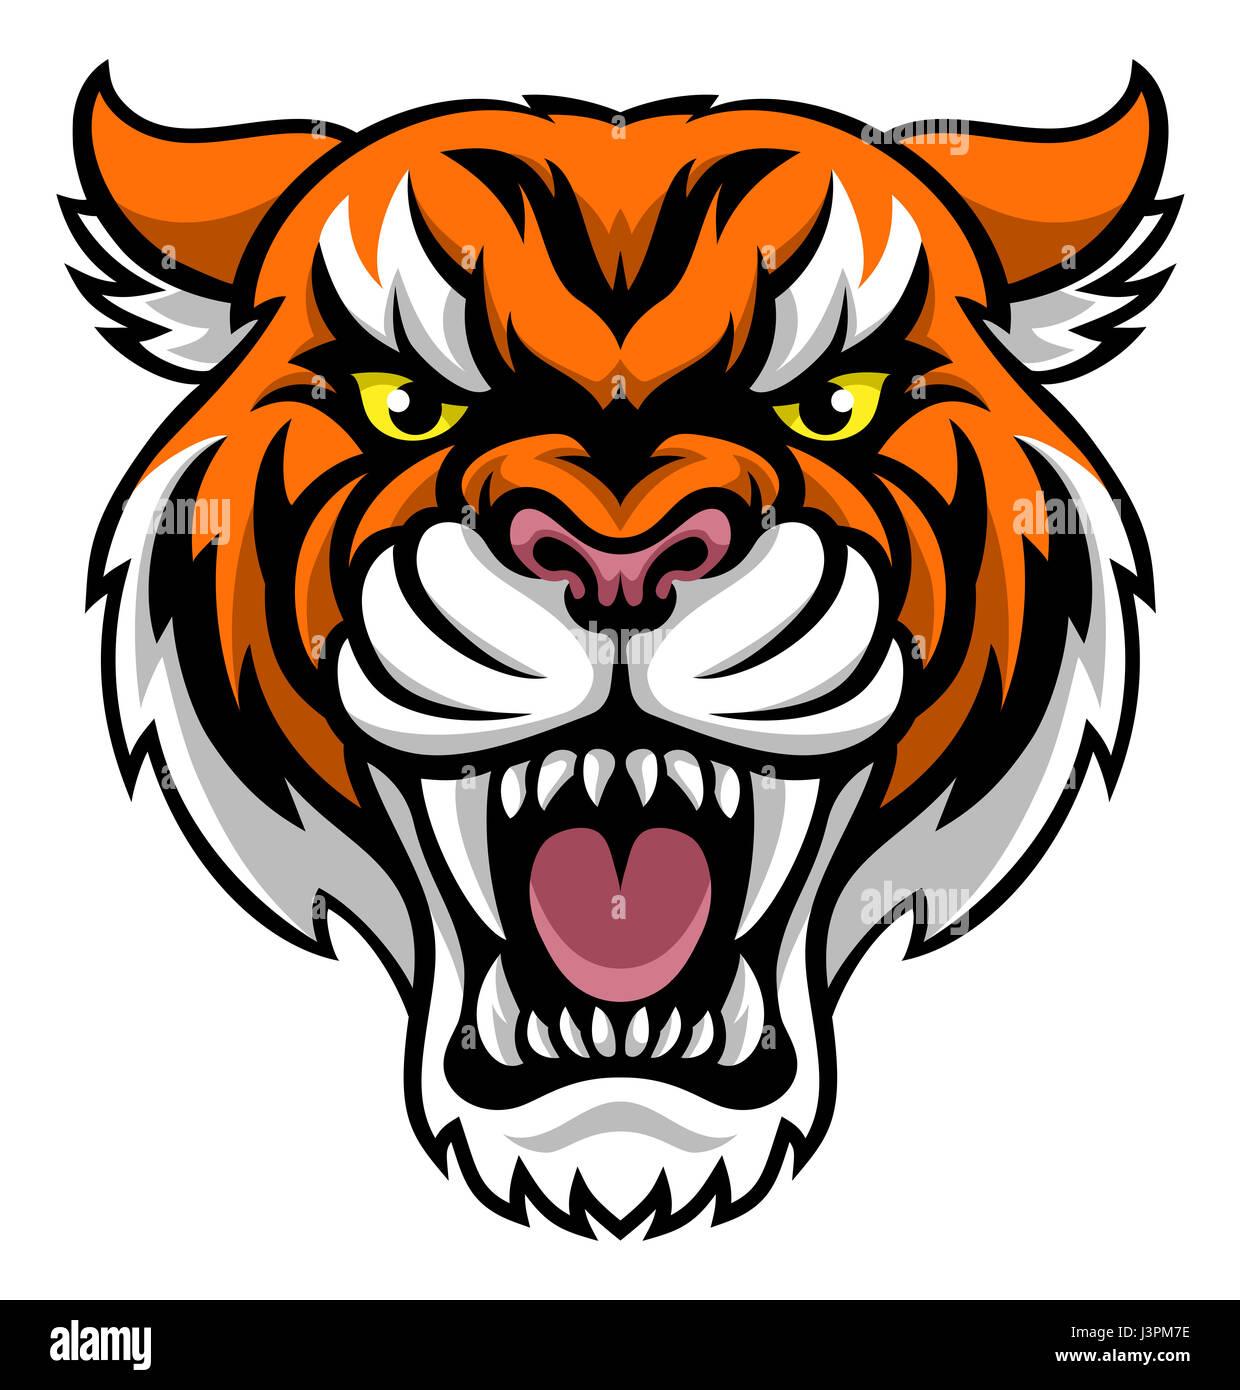 An angry looking tiger mascot animal character Stock Photo ...